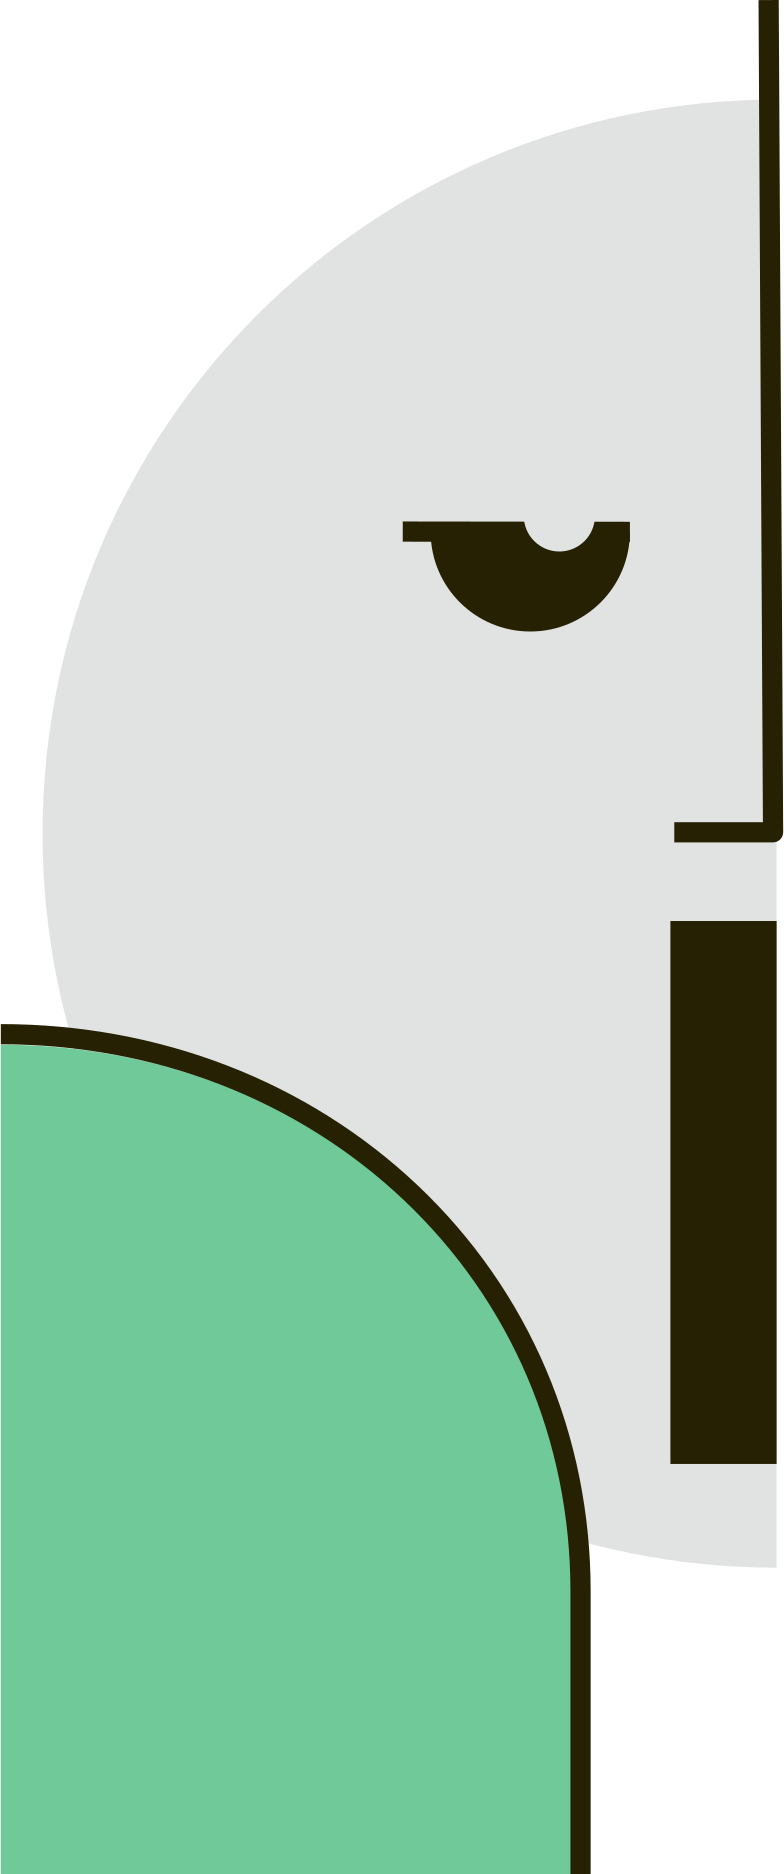 money bank Clipart illustration in PNG, SVG